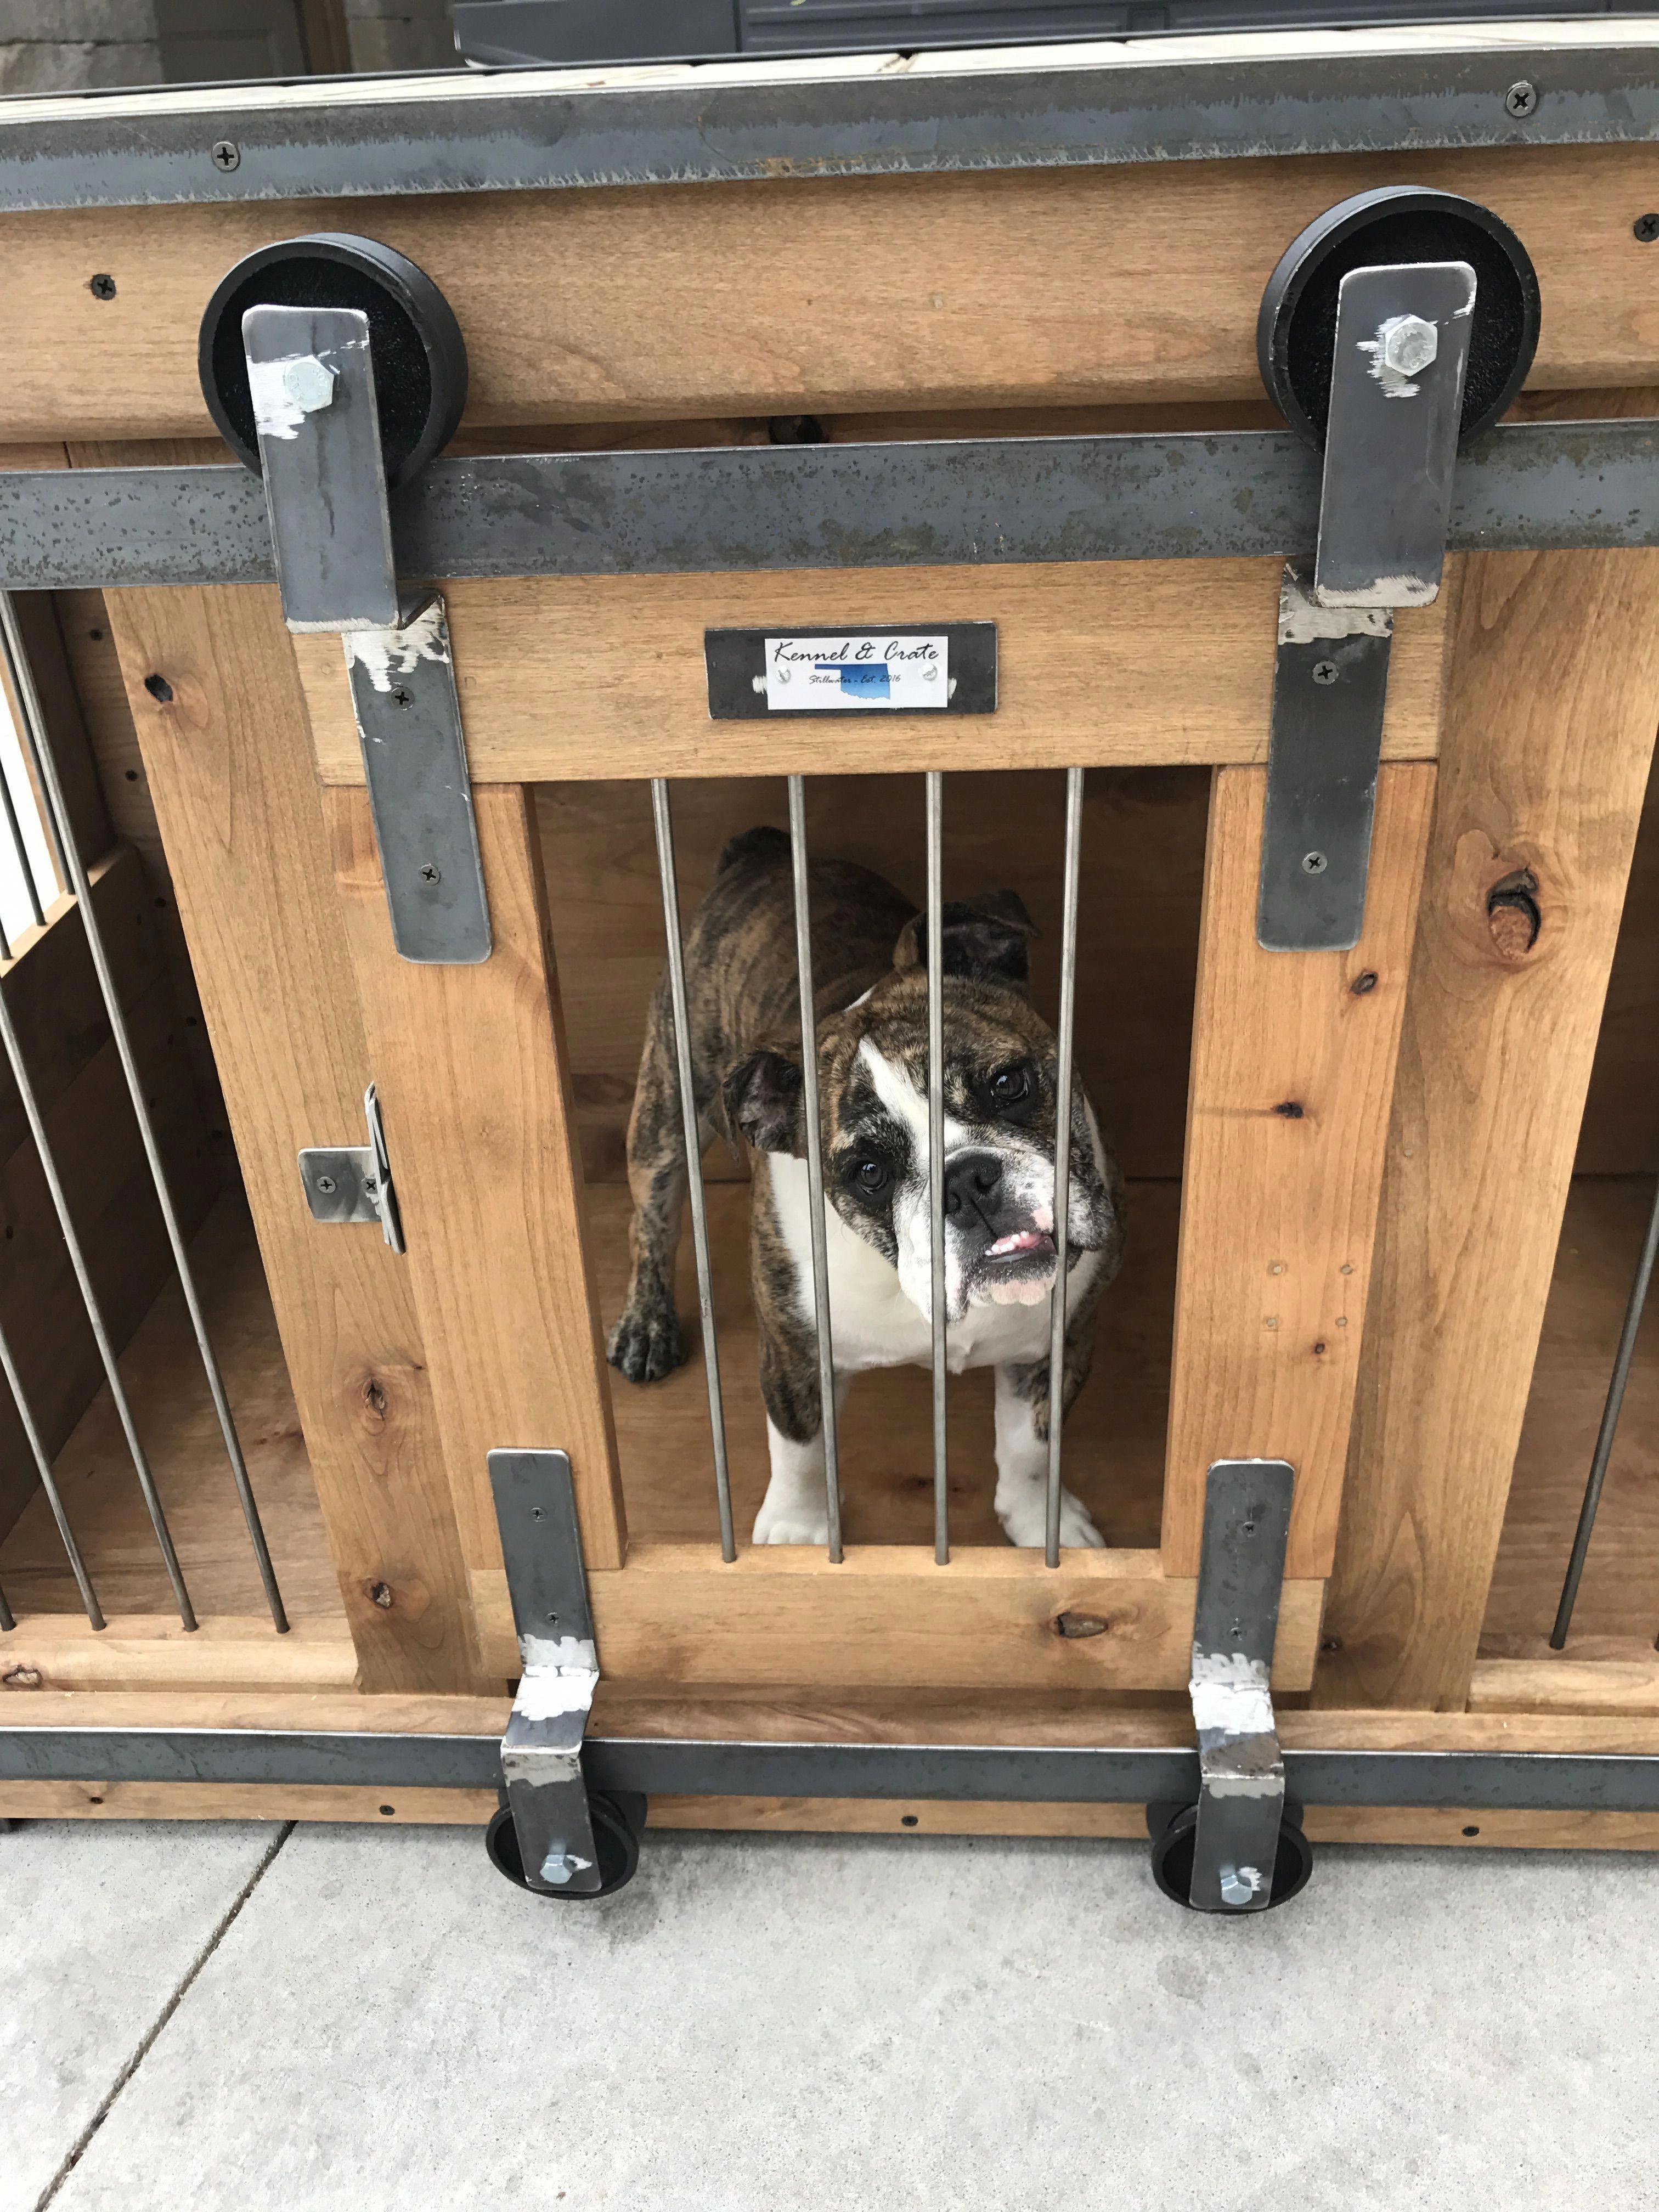 Dog Areas In House Garage Dogareasinhousegarage Luxury Dog Kennels Dog Crate Dog Kennel Cover